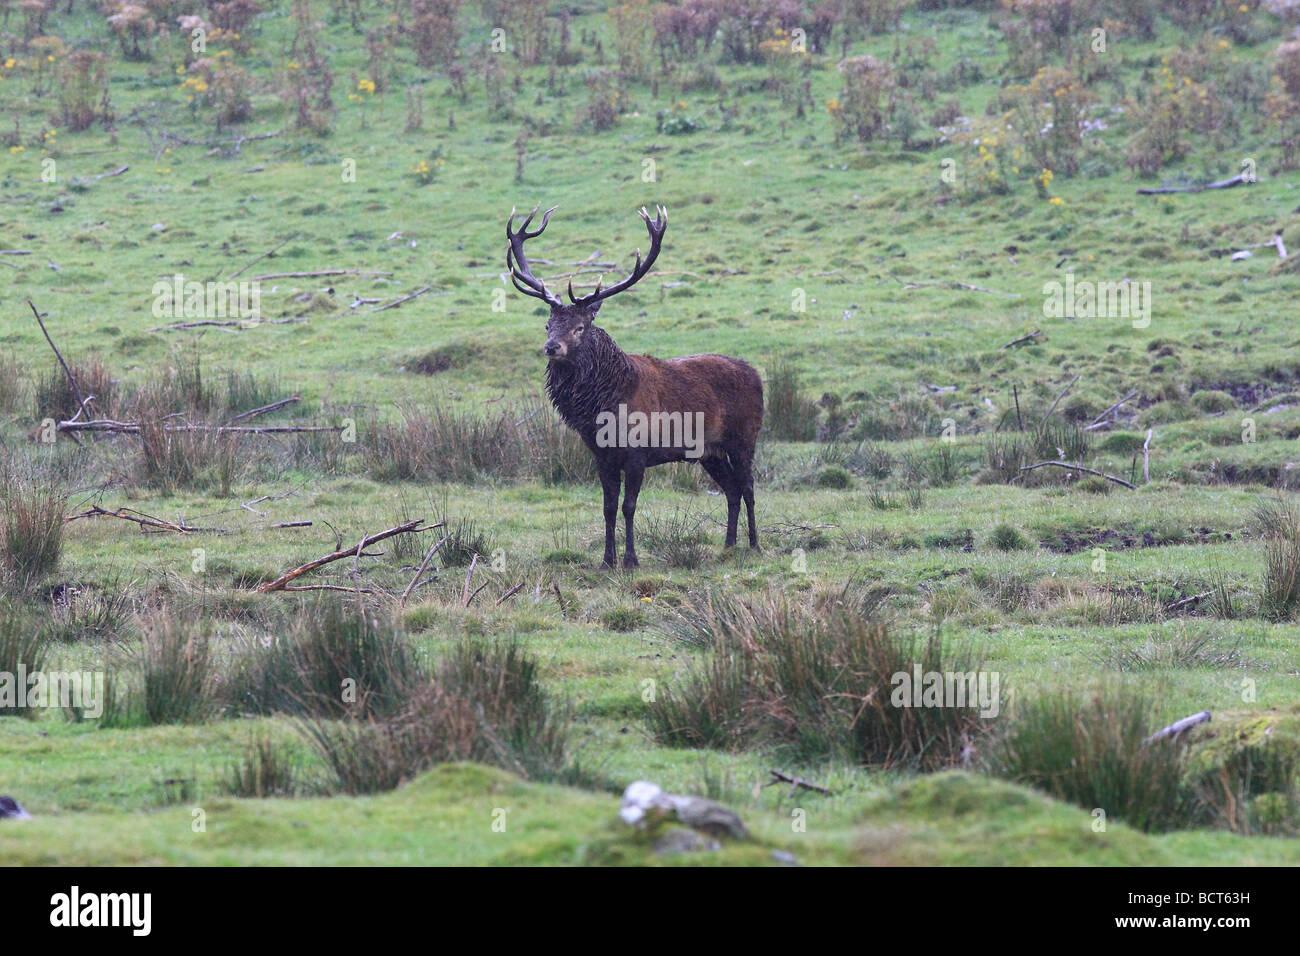 The Red Deer (Cervus elaphus) is one of the largest deer species. The Red Deer inhabits most of Europe - standing Stock Photo